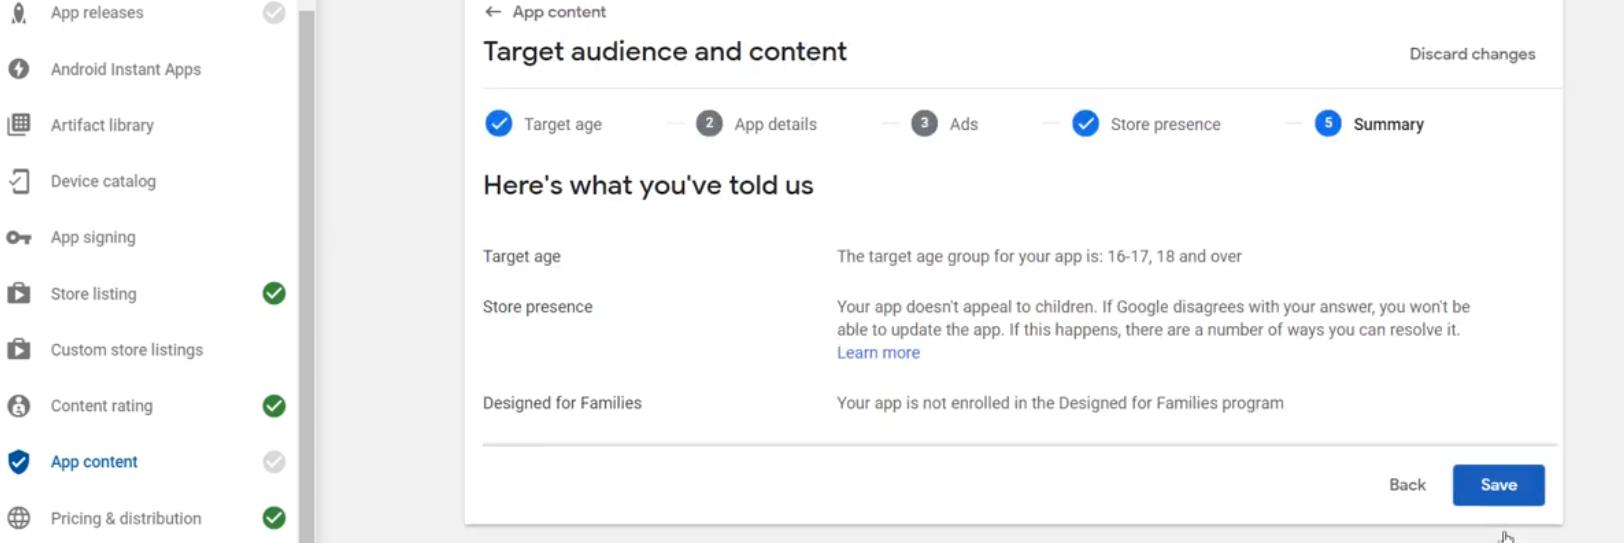 app-content-section